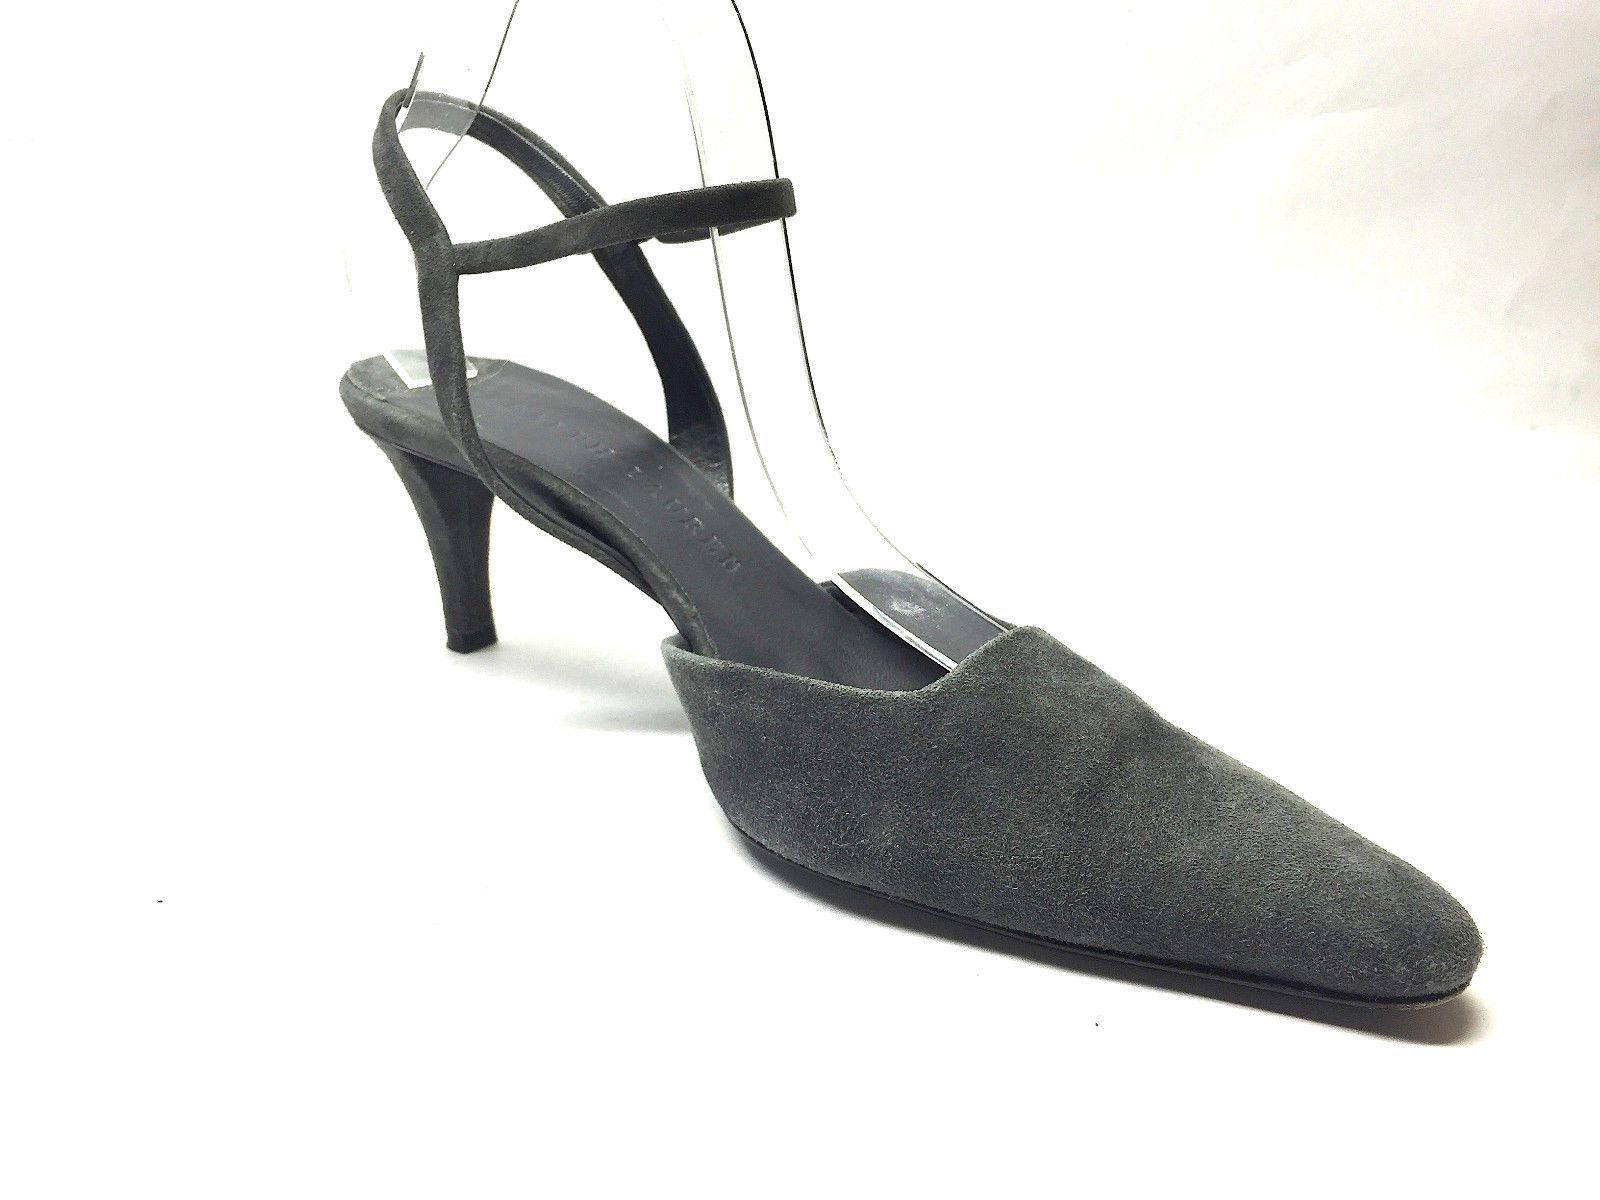 RALPH LAUREN Graphite-Gray Suede Ankle Strap Heel Slingback Pumps Shoes Size: 7